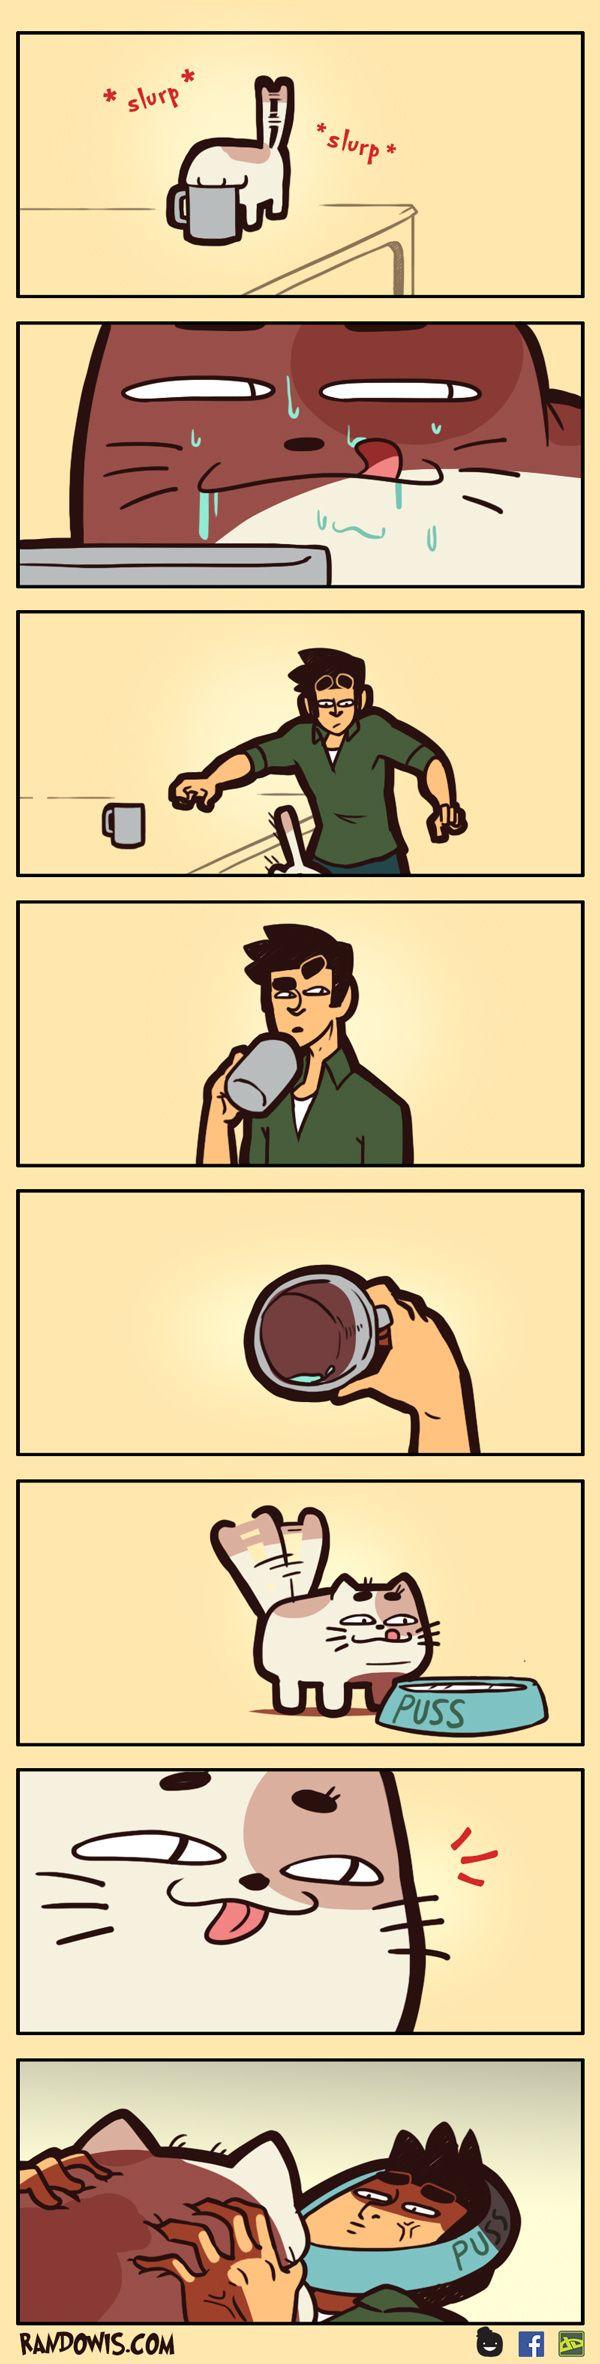 RandoWis :: Drink